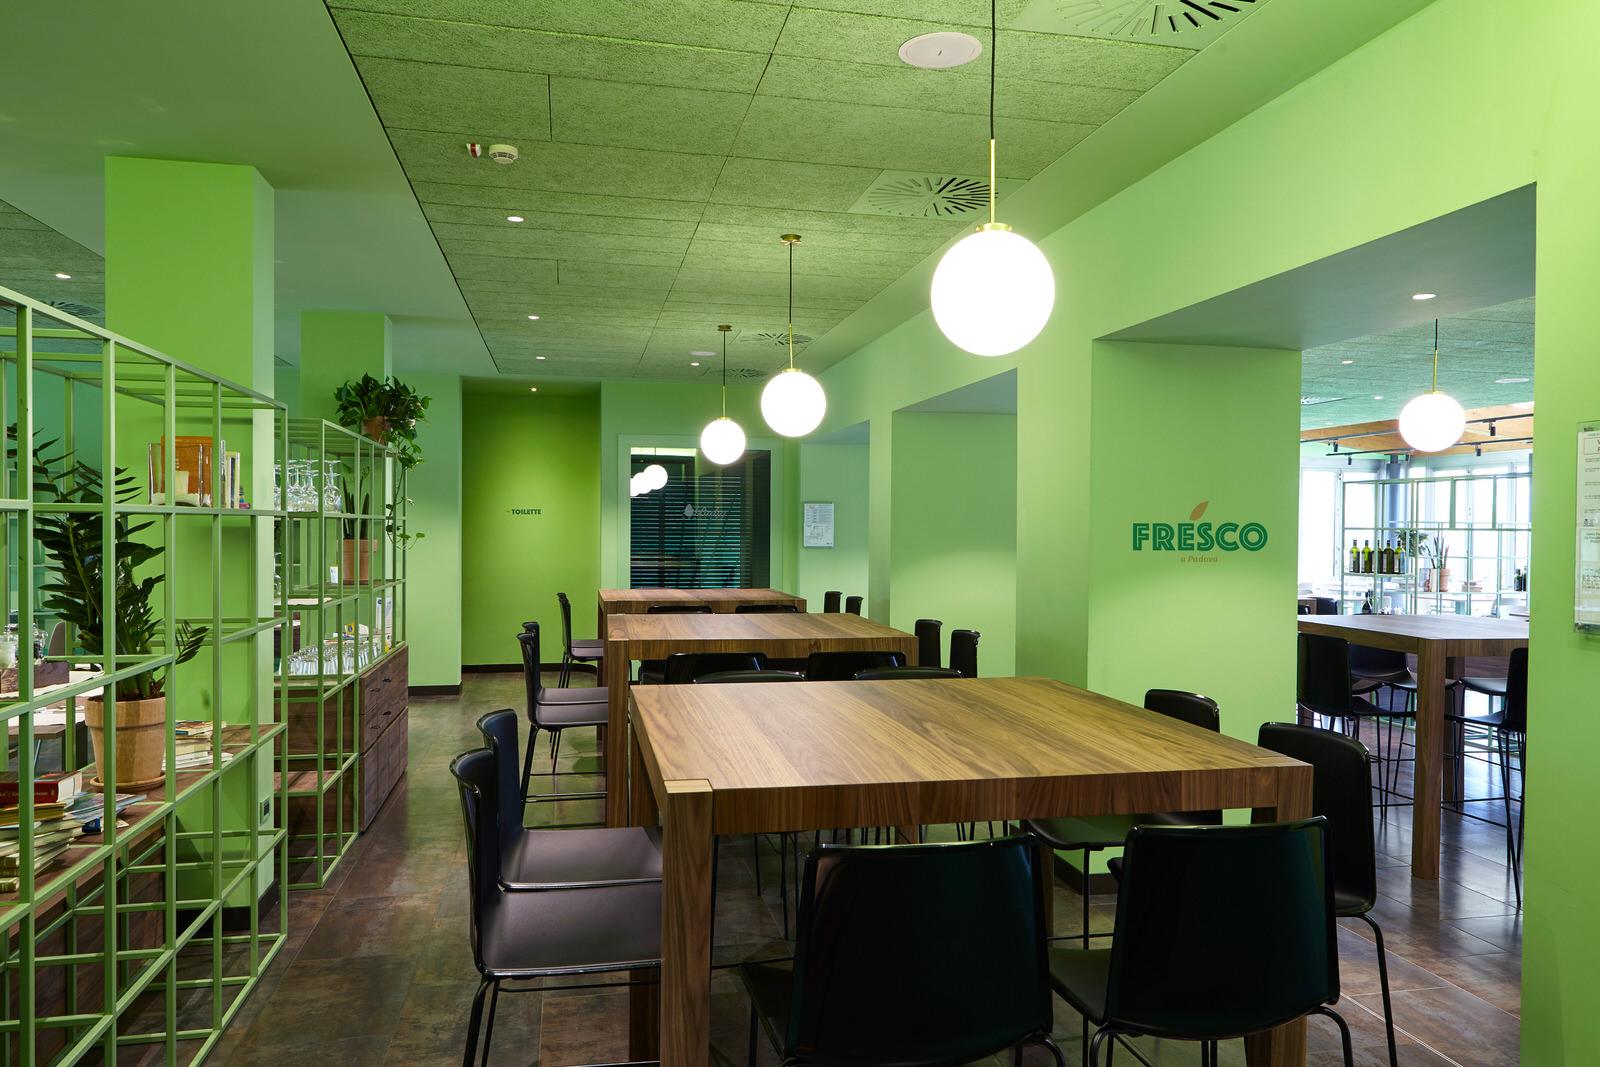 nicolaferiottistudio_fresco_a_padova_10